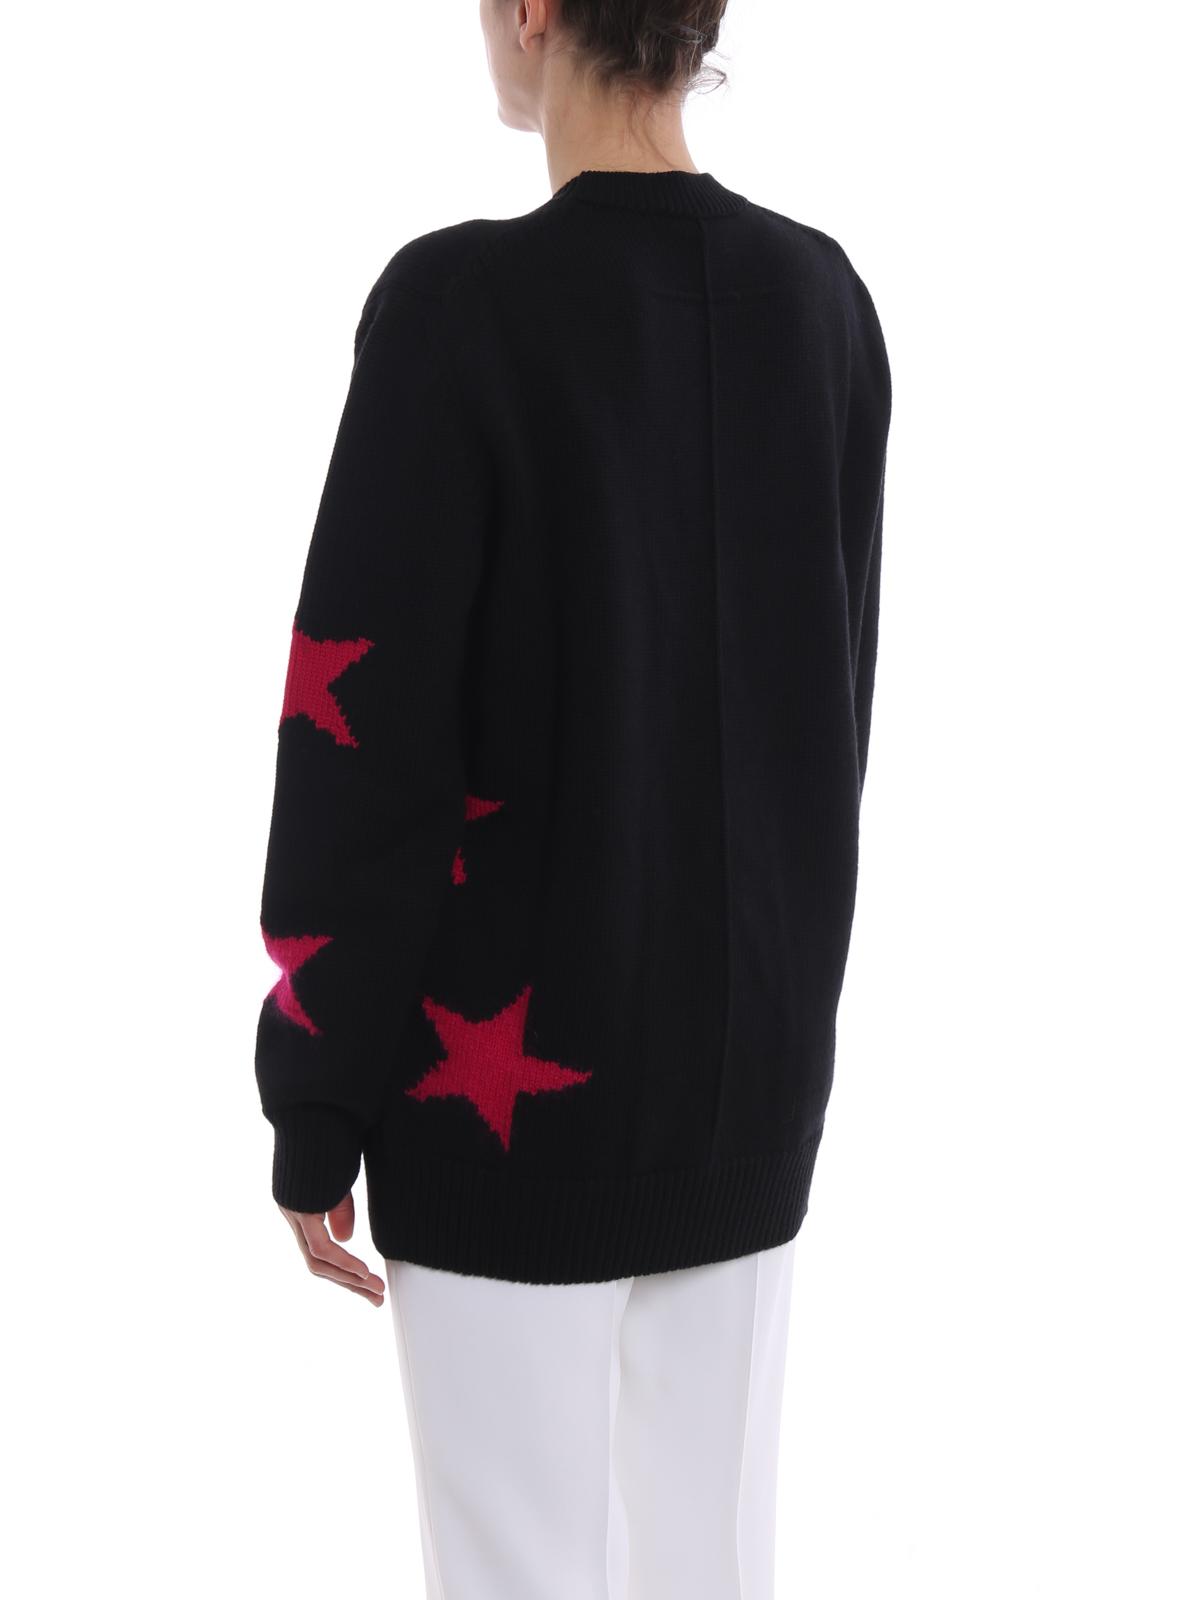 14a86d3bdf882 Givenchy - Star intarsia wool oversize sweater - crew necks ...